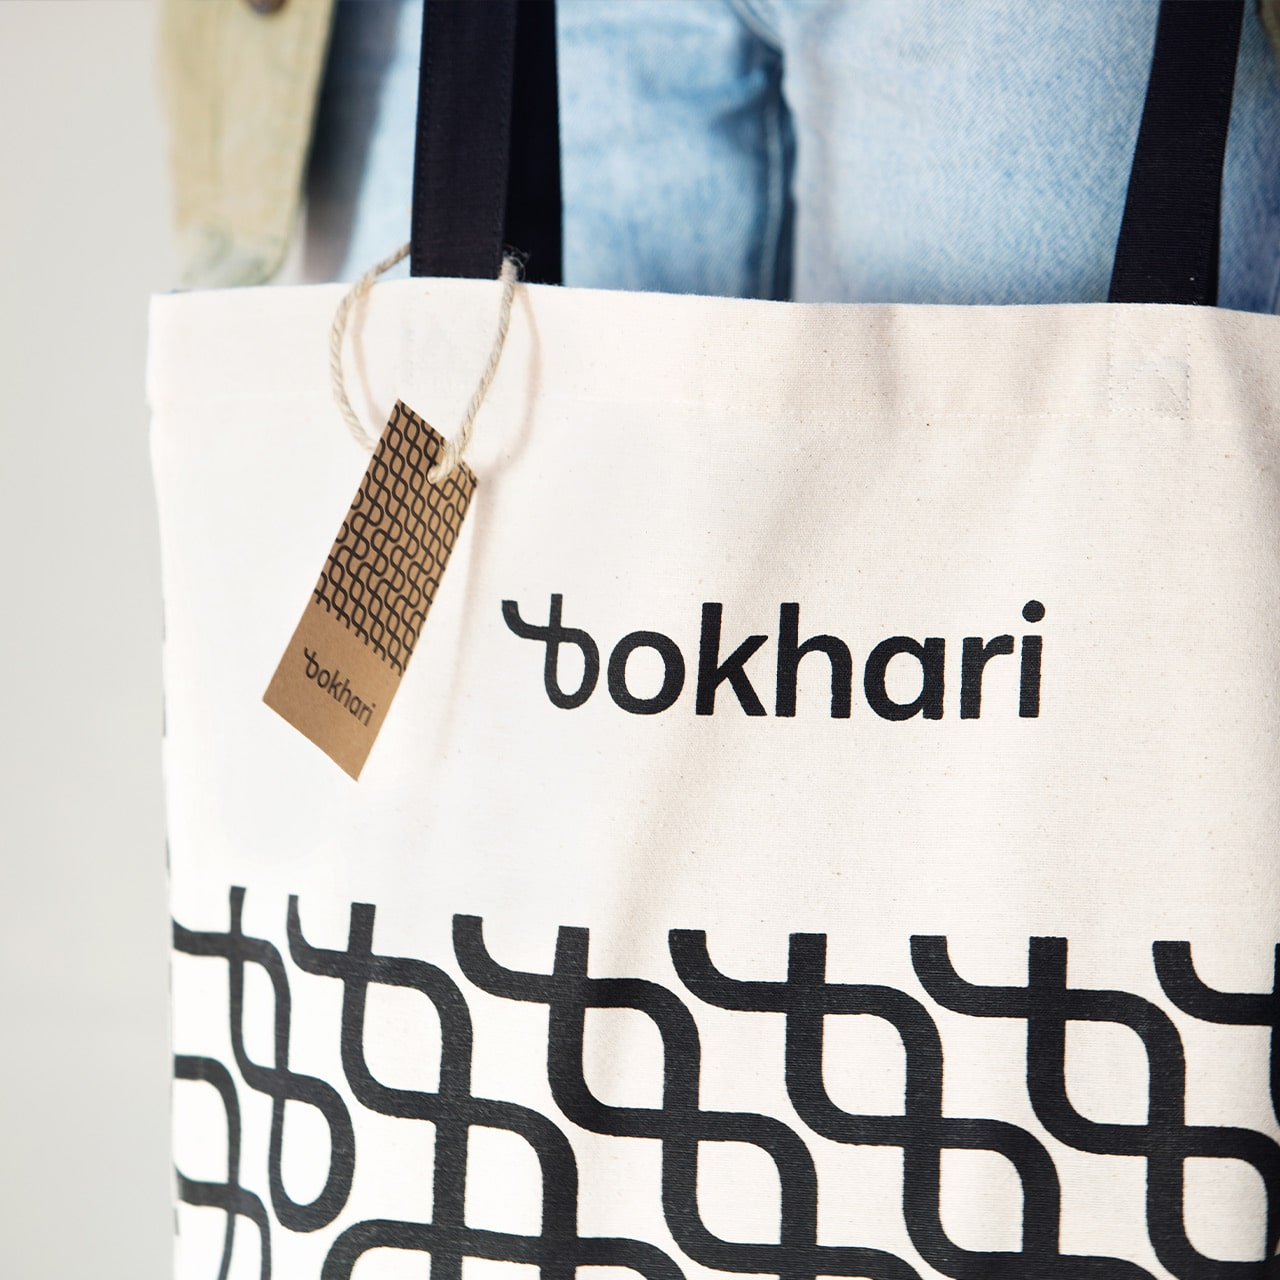 Bokhari totes and more